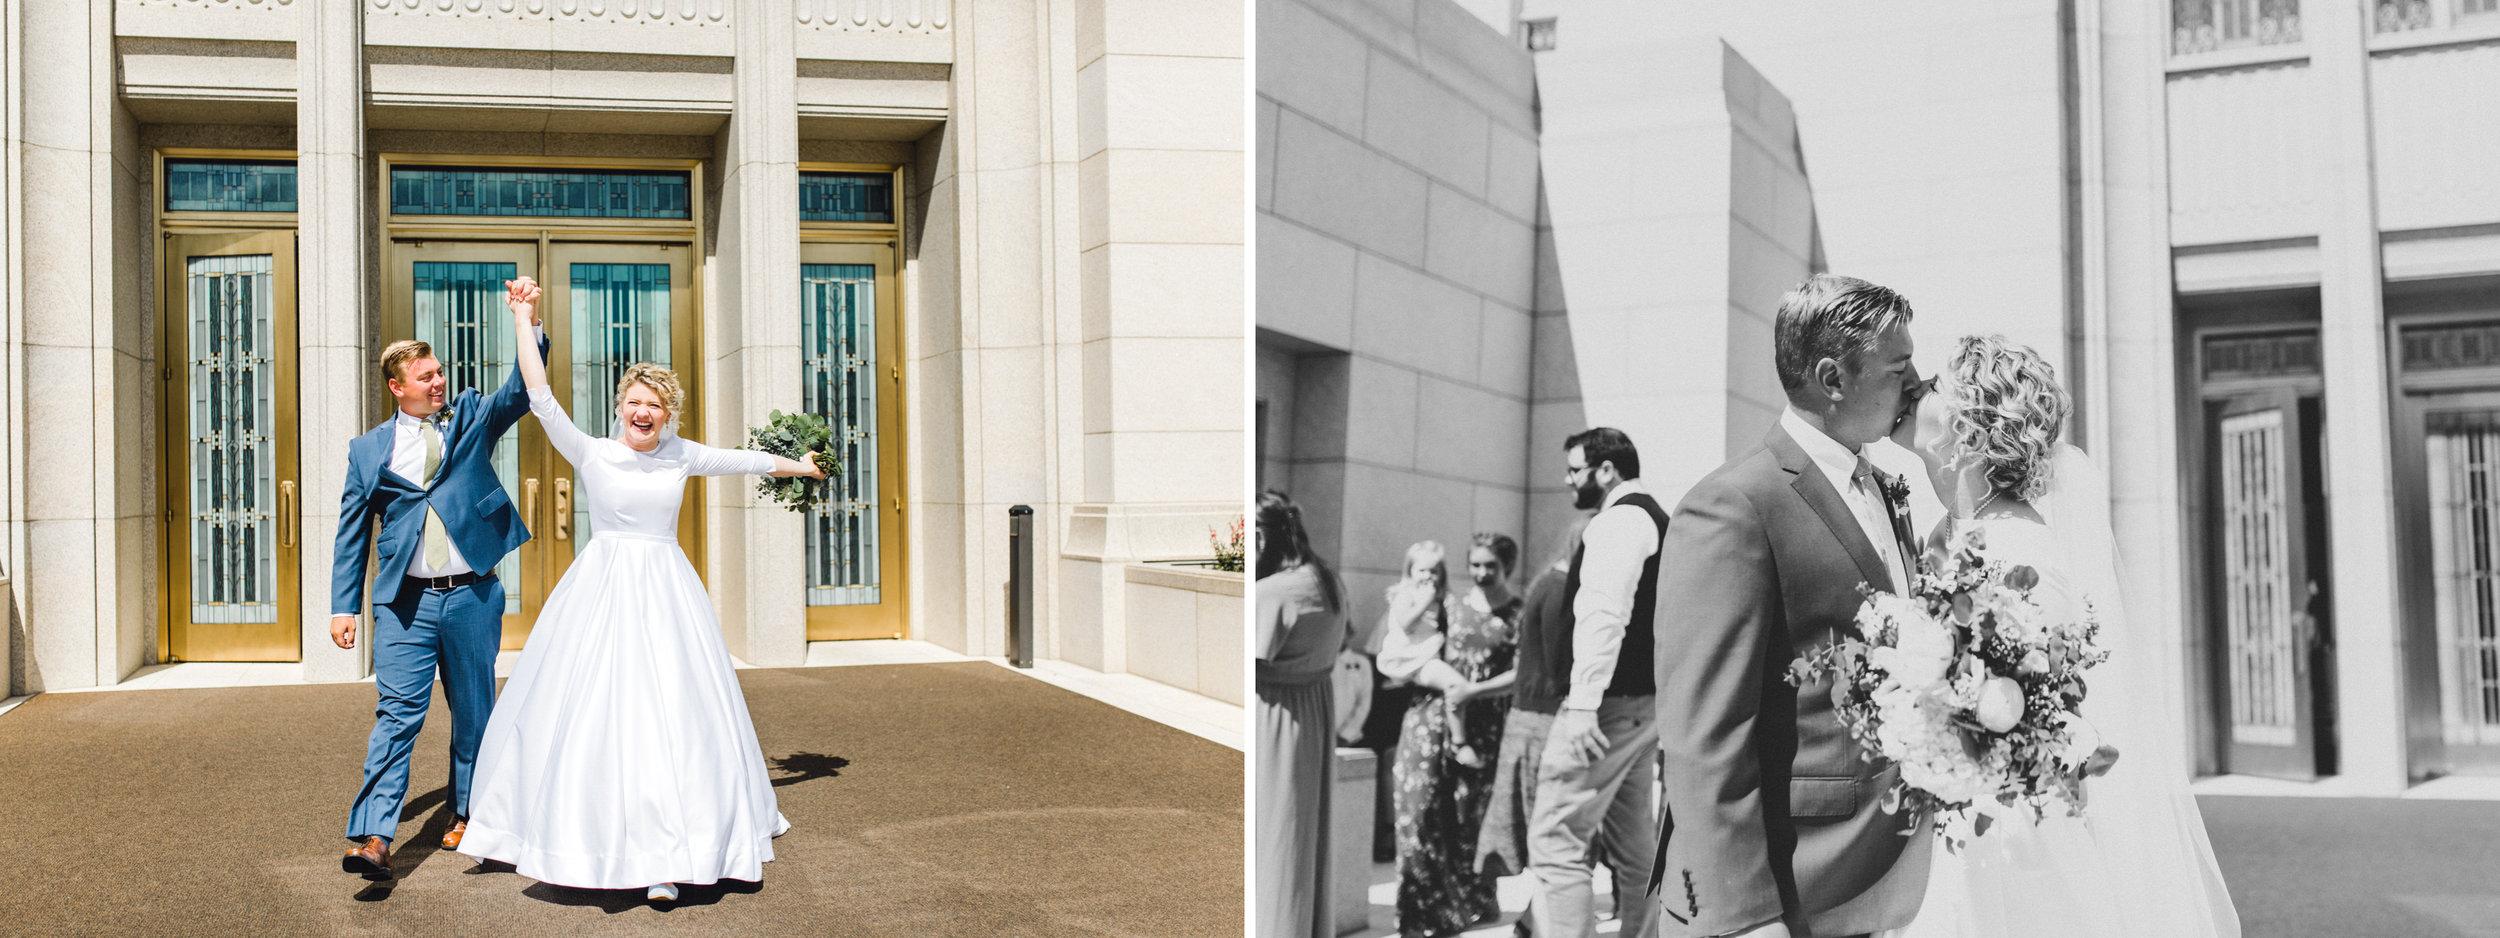 ogden-utah-lds-temple-photographer-anna-christine-photography-noah-emma-2.jpg